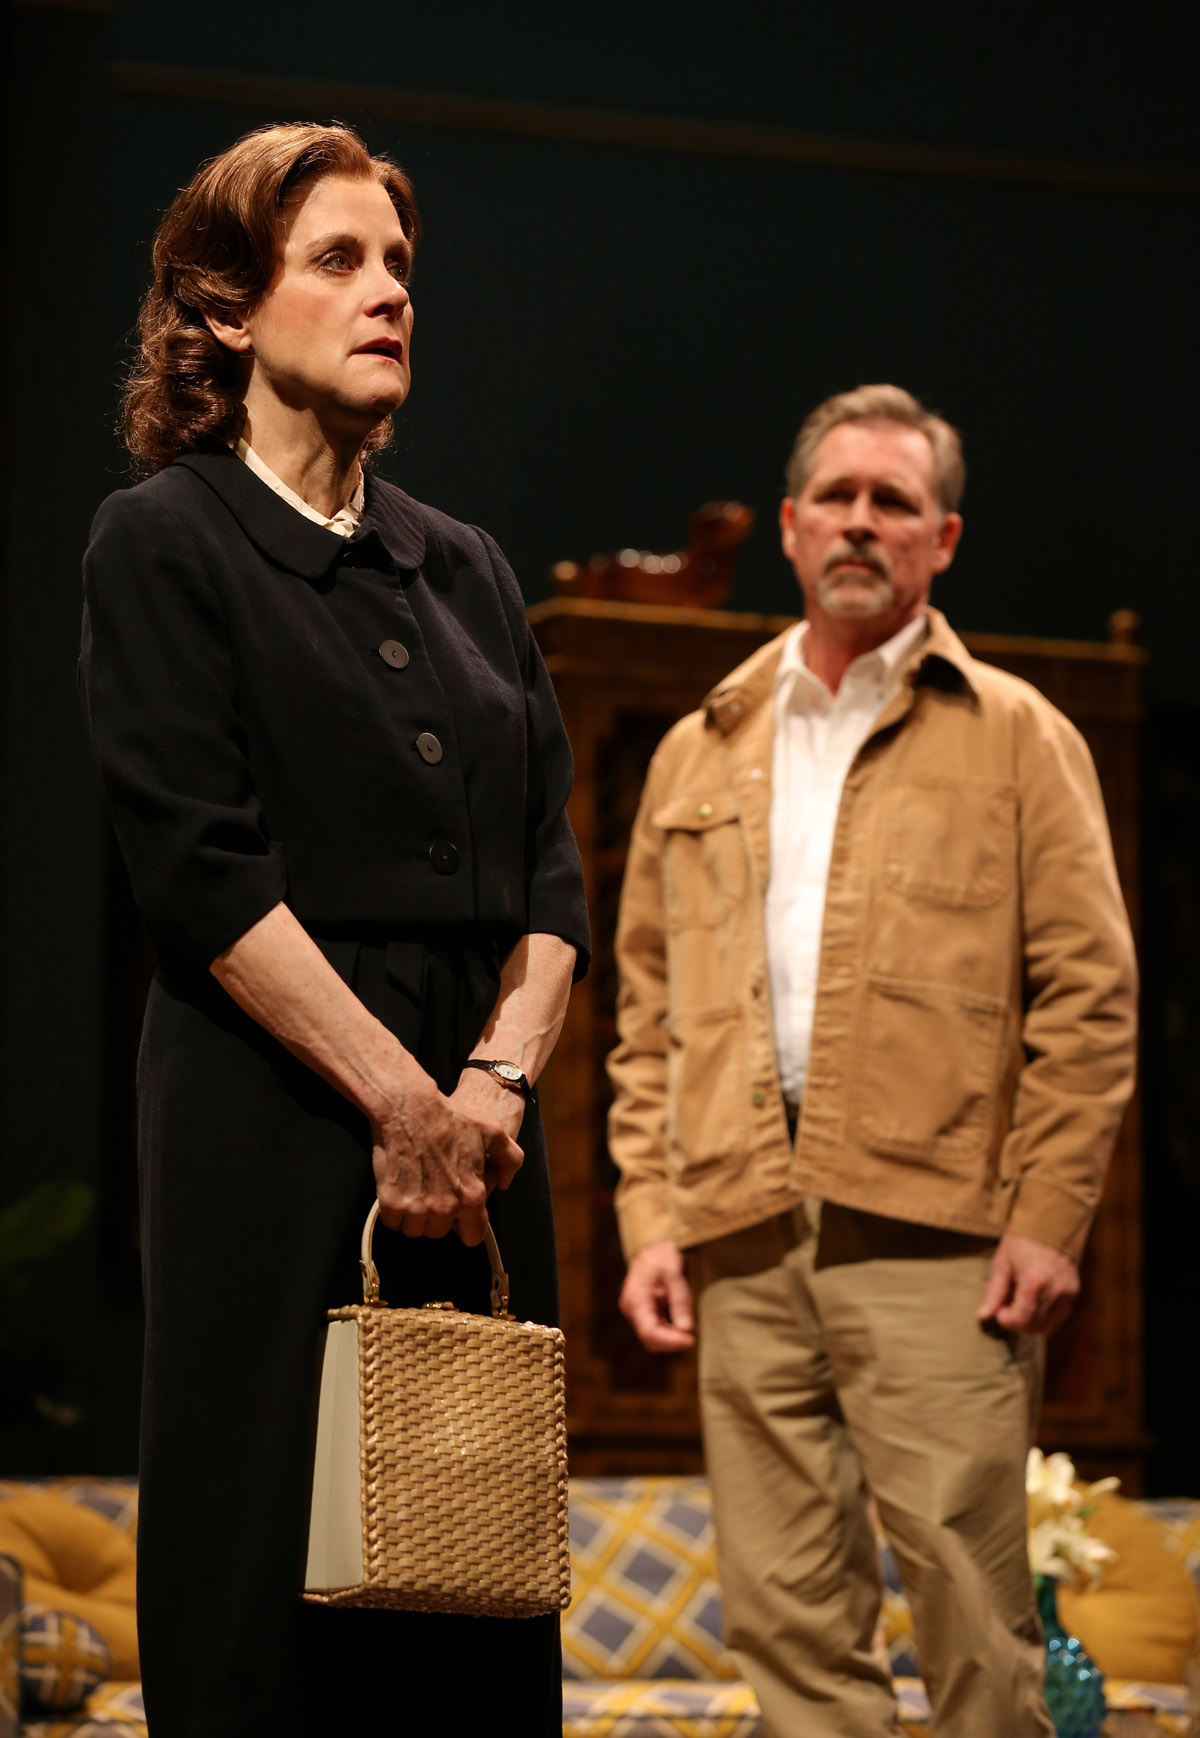 Dorothy Morrison (actress)